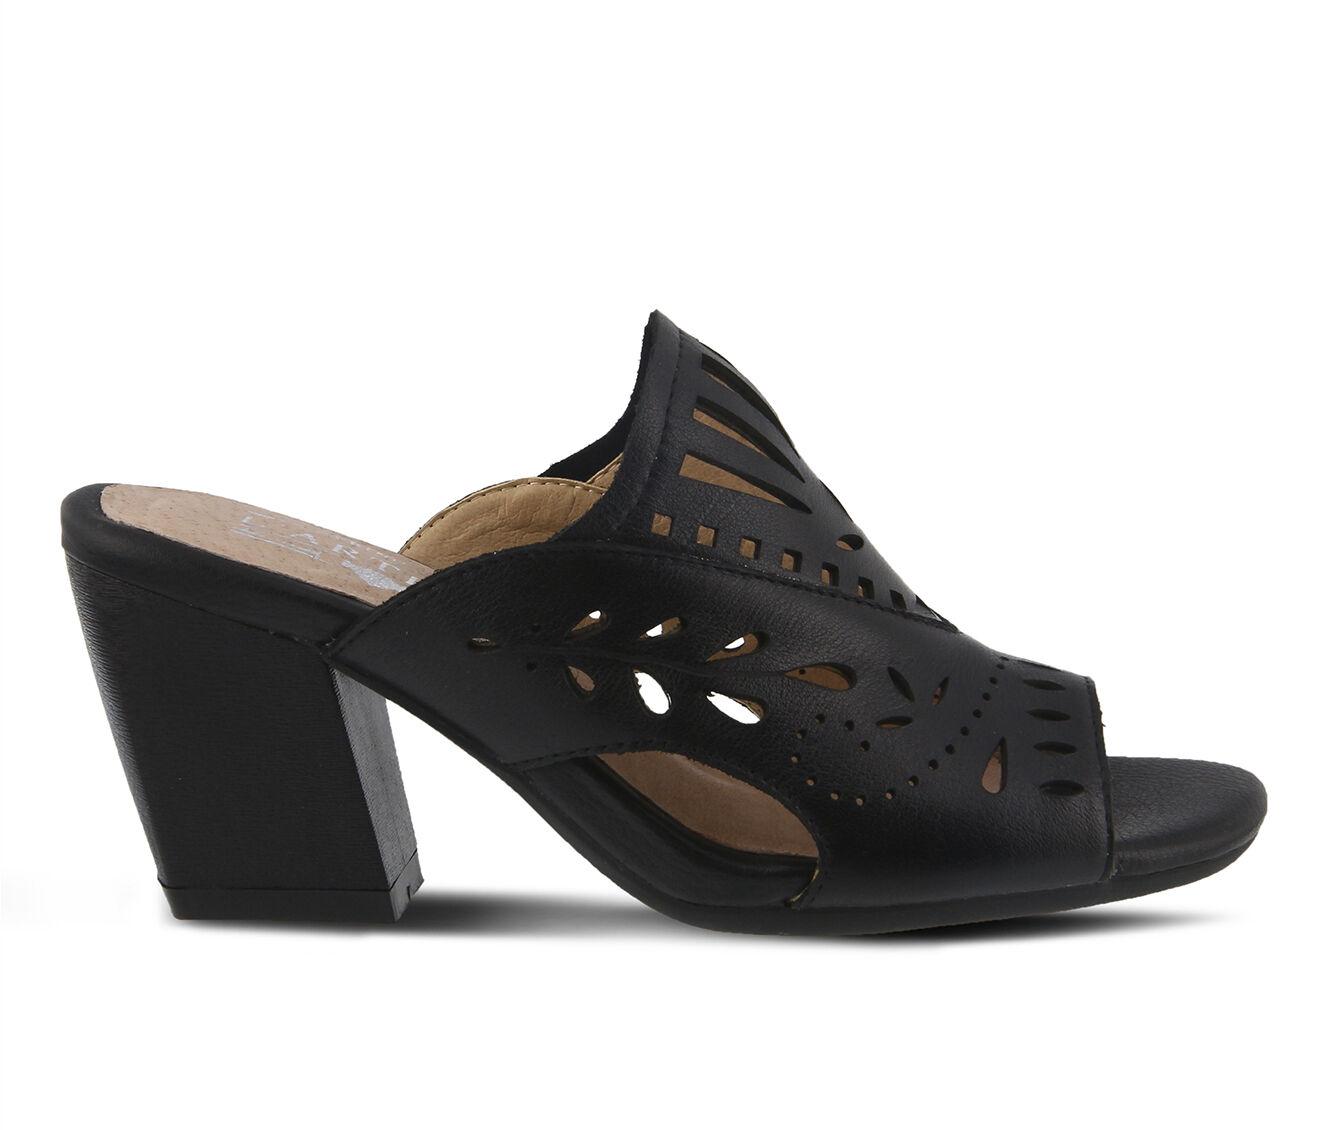 Women's L'ARTISTE Zyzana Dress Sandals Black